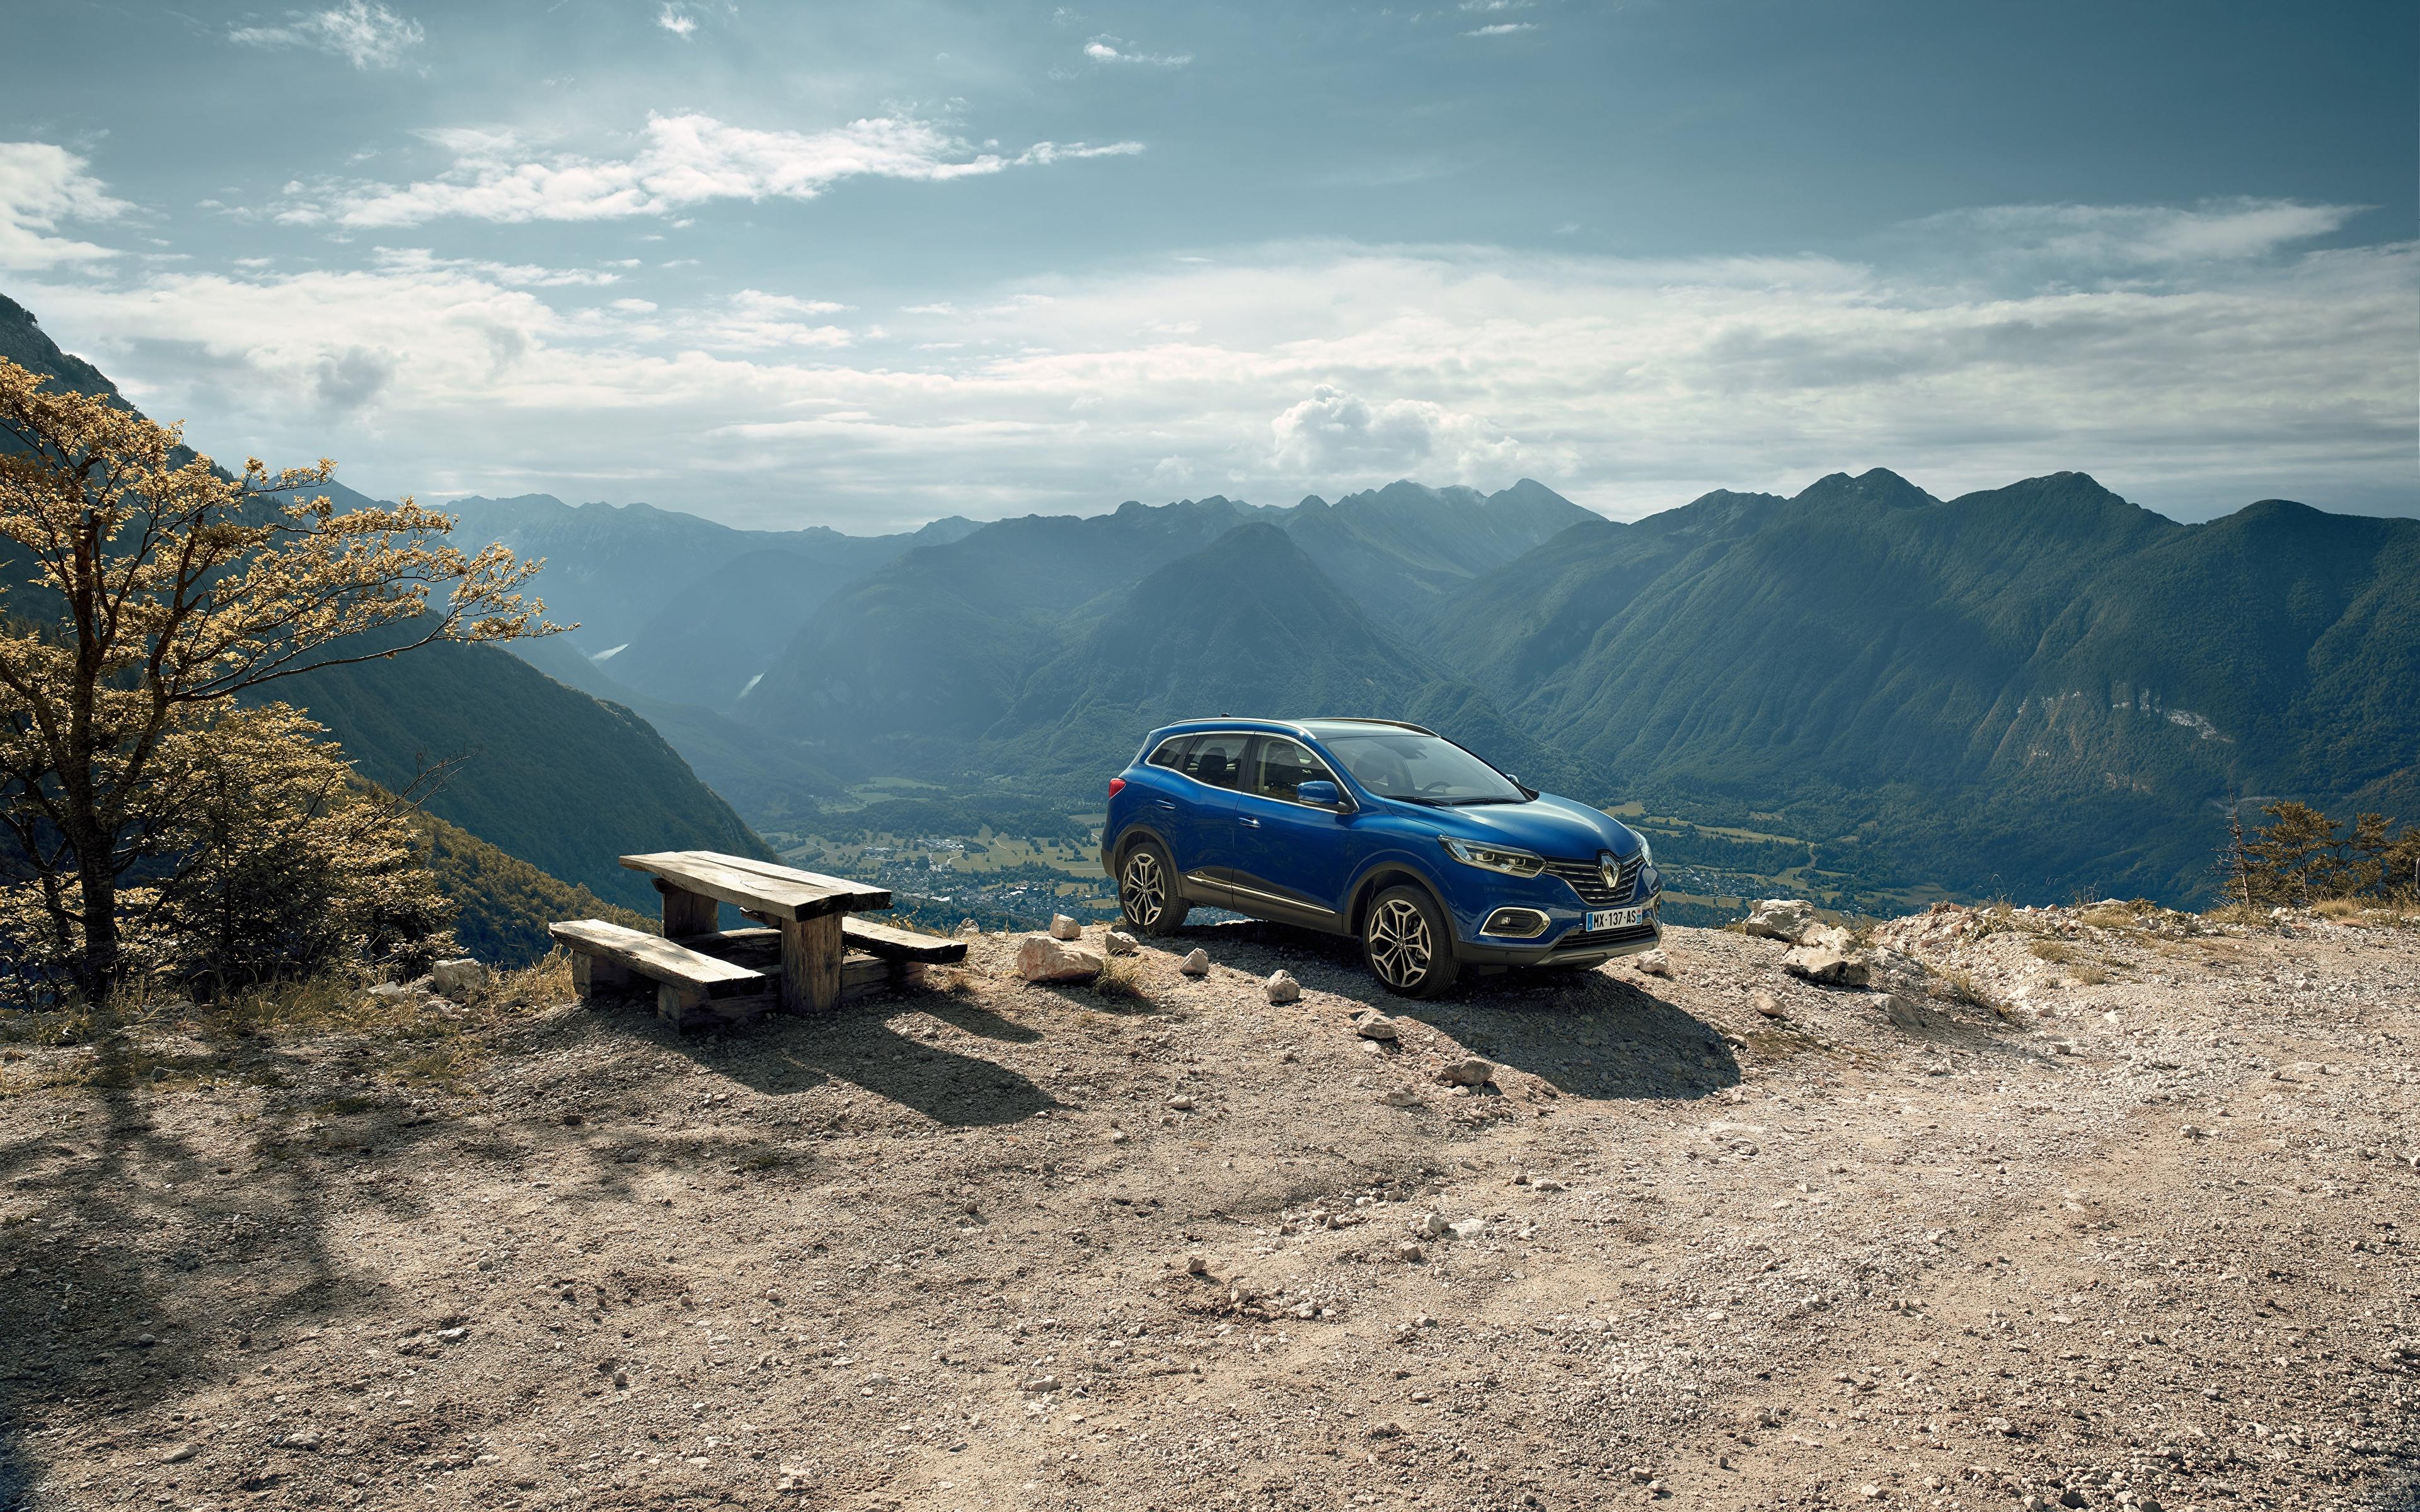 Картинка Рено 2018 Kadjar Worldwide Синий Автомобили 3840x2400 Renault Авто Машины